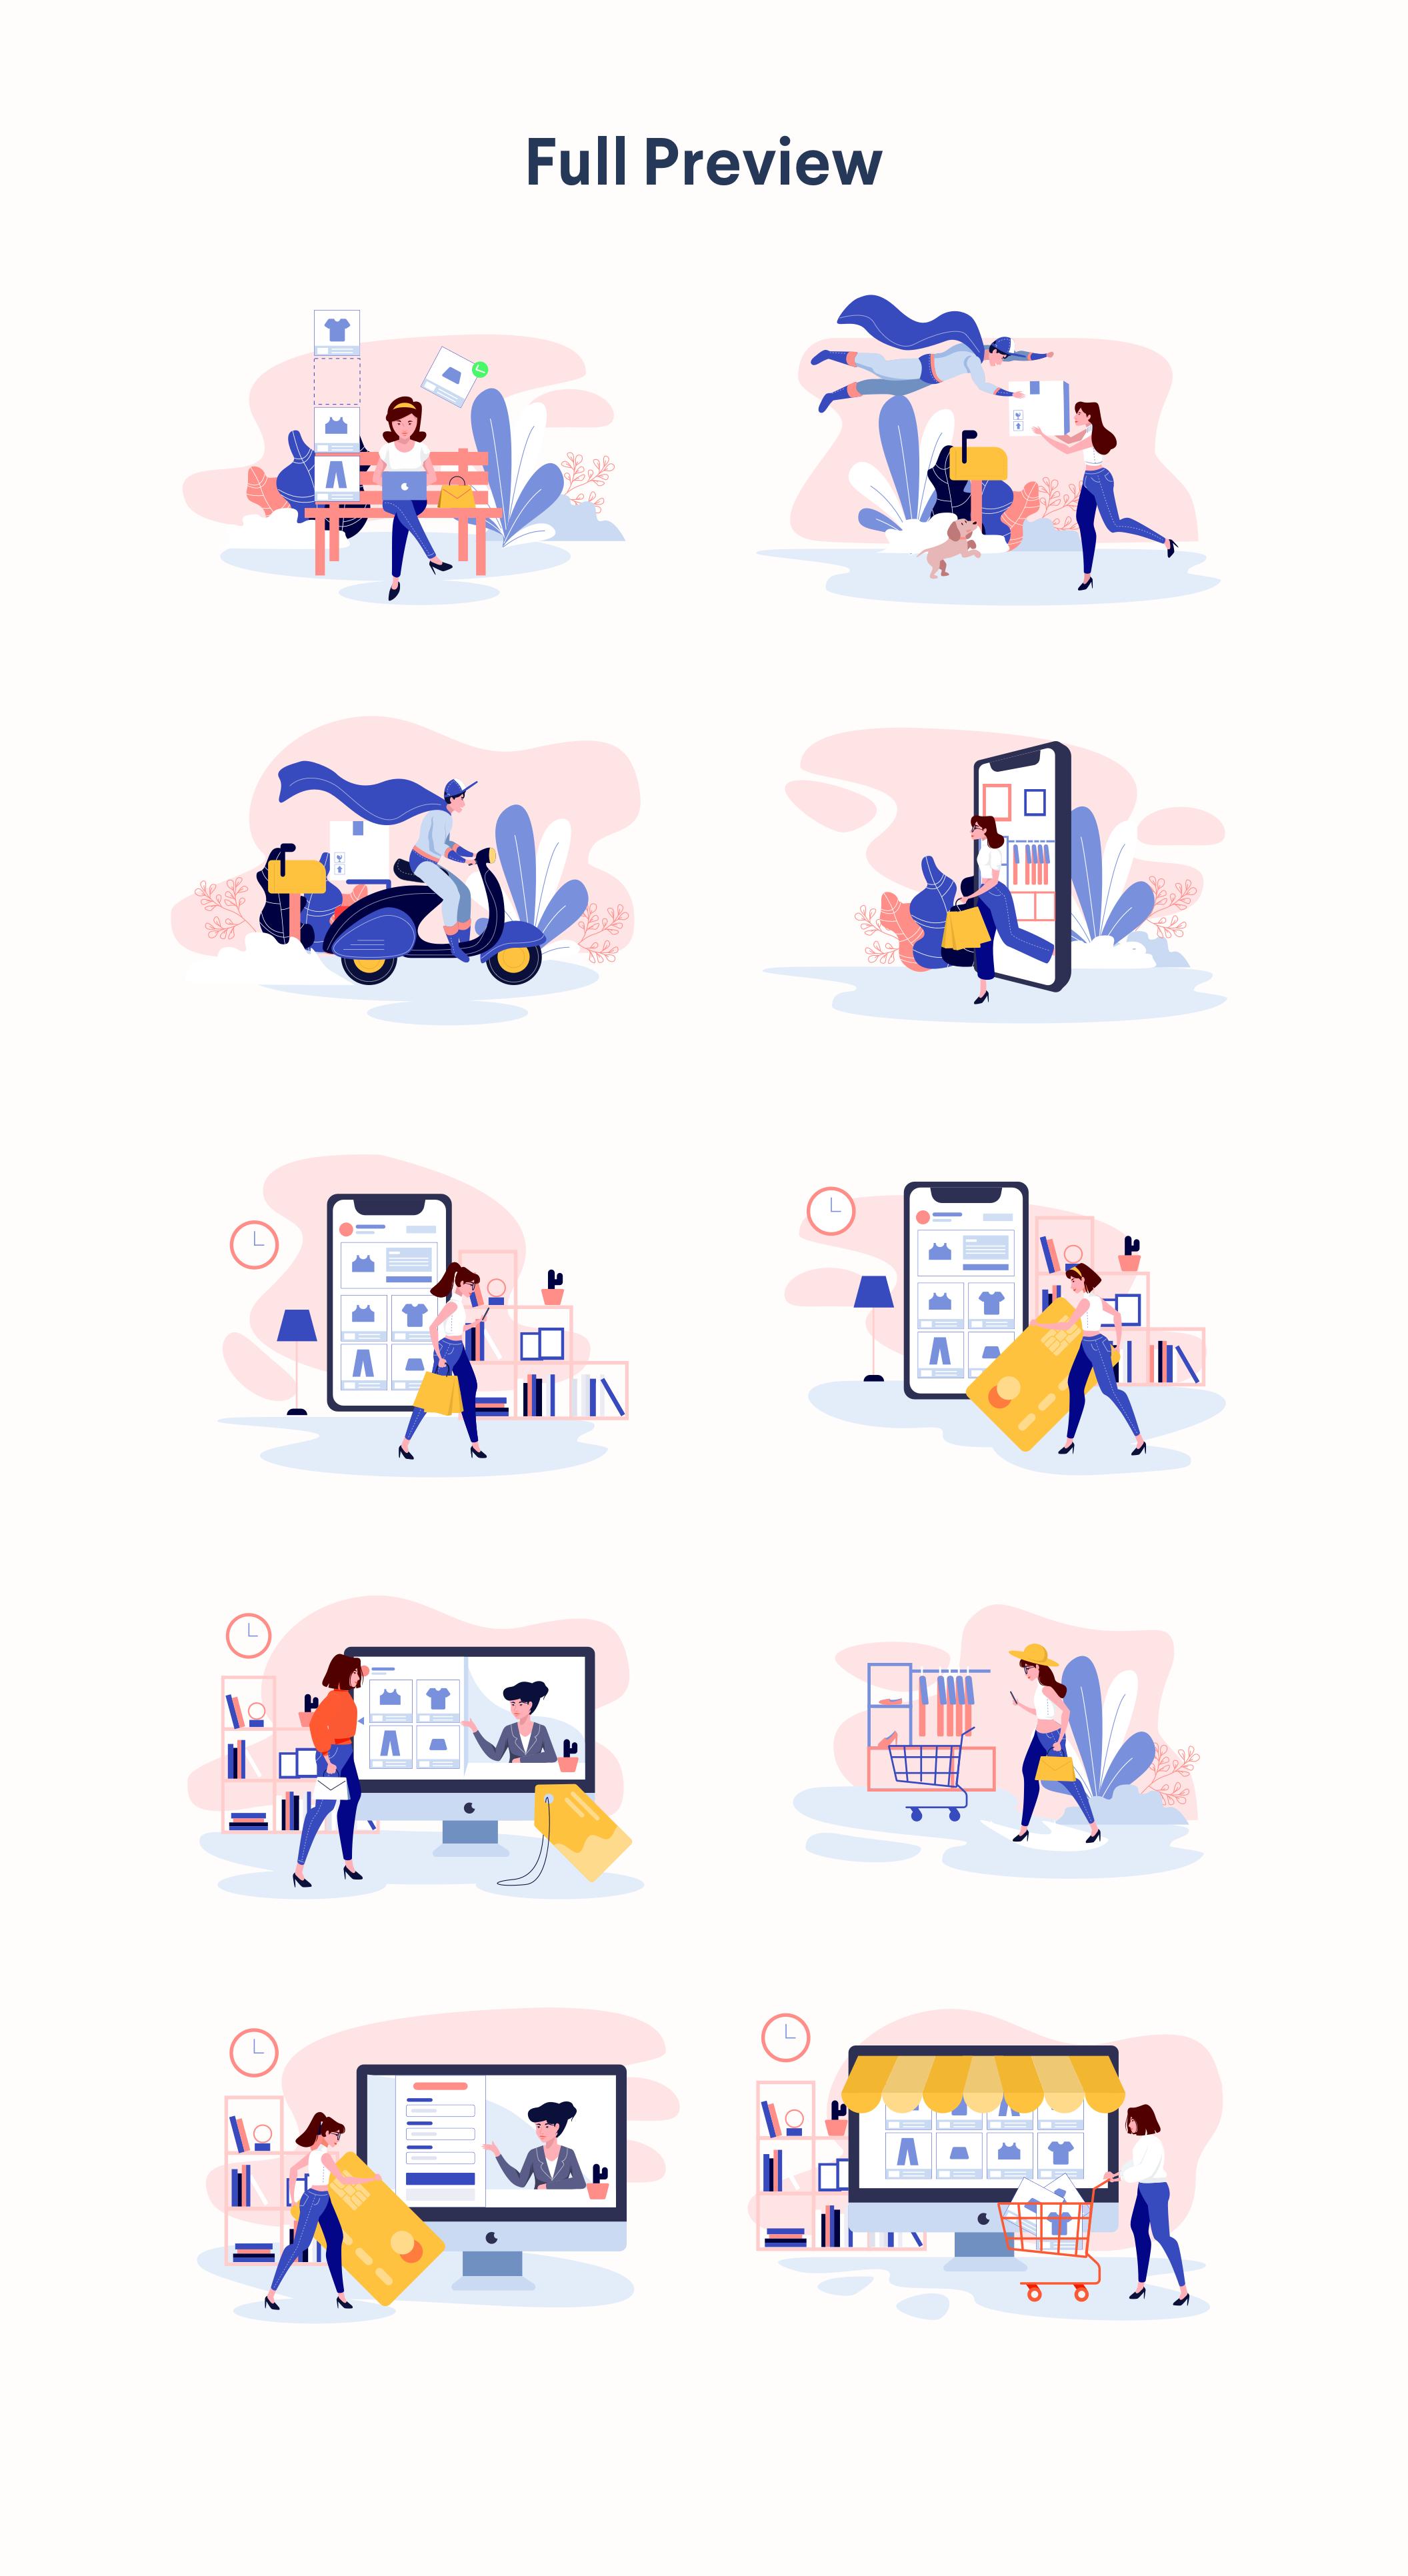 时尚购物商城2.5D矢量概念插画 Lunas : E-commerce Illustration Kit插图(9)